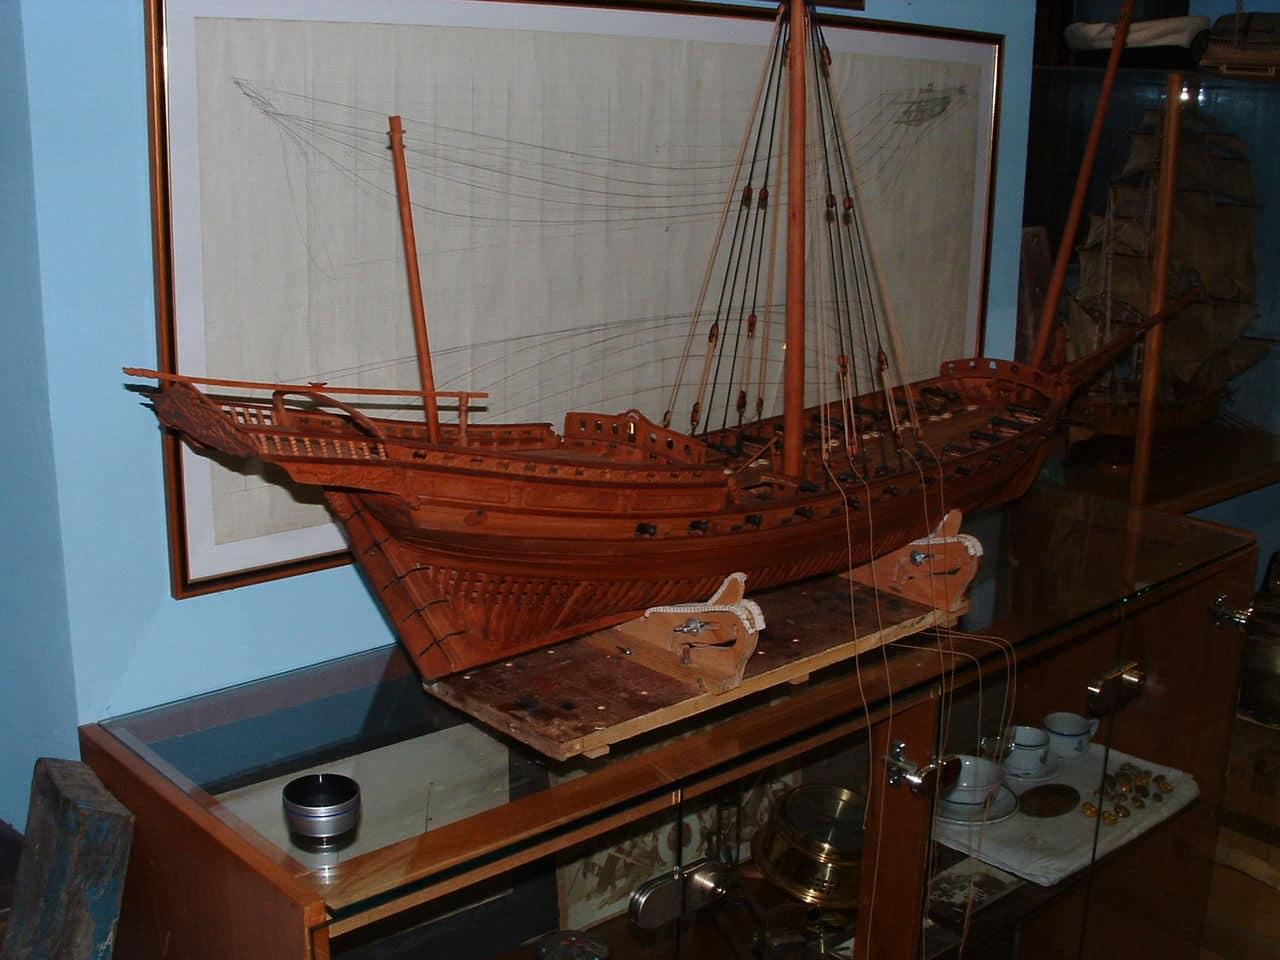 Chebec Le Requin - 1750 1228